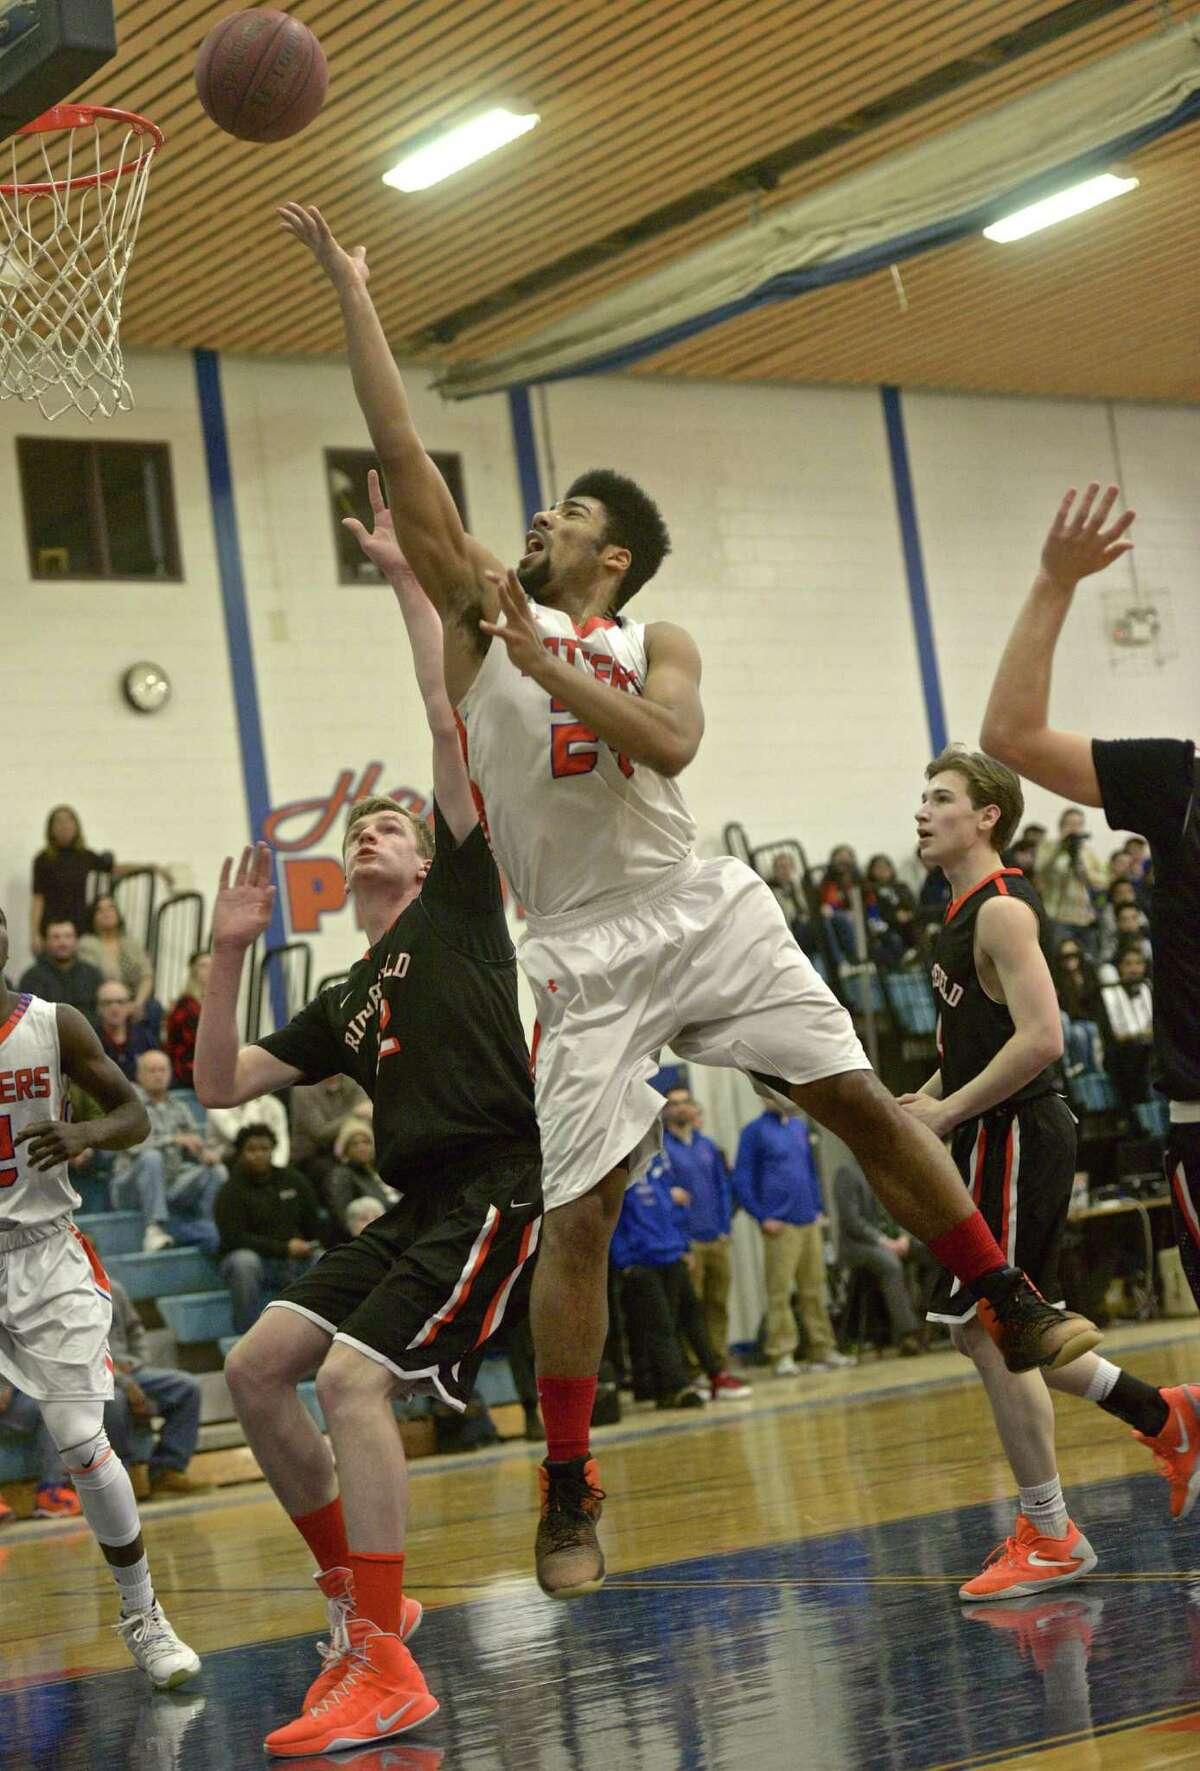 Danbury's Marcus Fox (24) goes to the basket over Ridgefield's Nicholas Laudati (42) in the boys high school basketball game between Ridgefield and Danbury high schools, Tuesday night, January 10, 2017, at Danbury High School, Danbury, Conn.